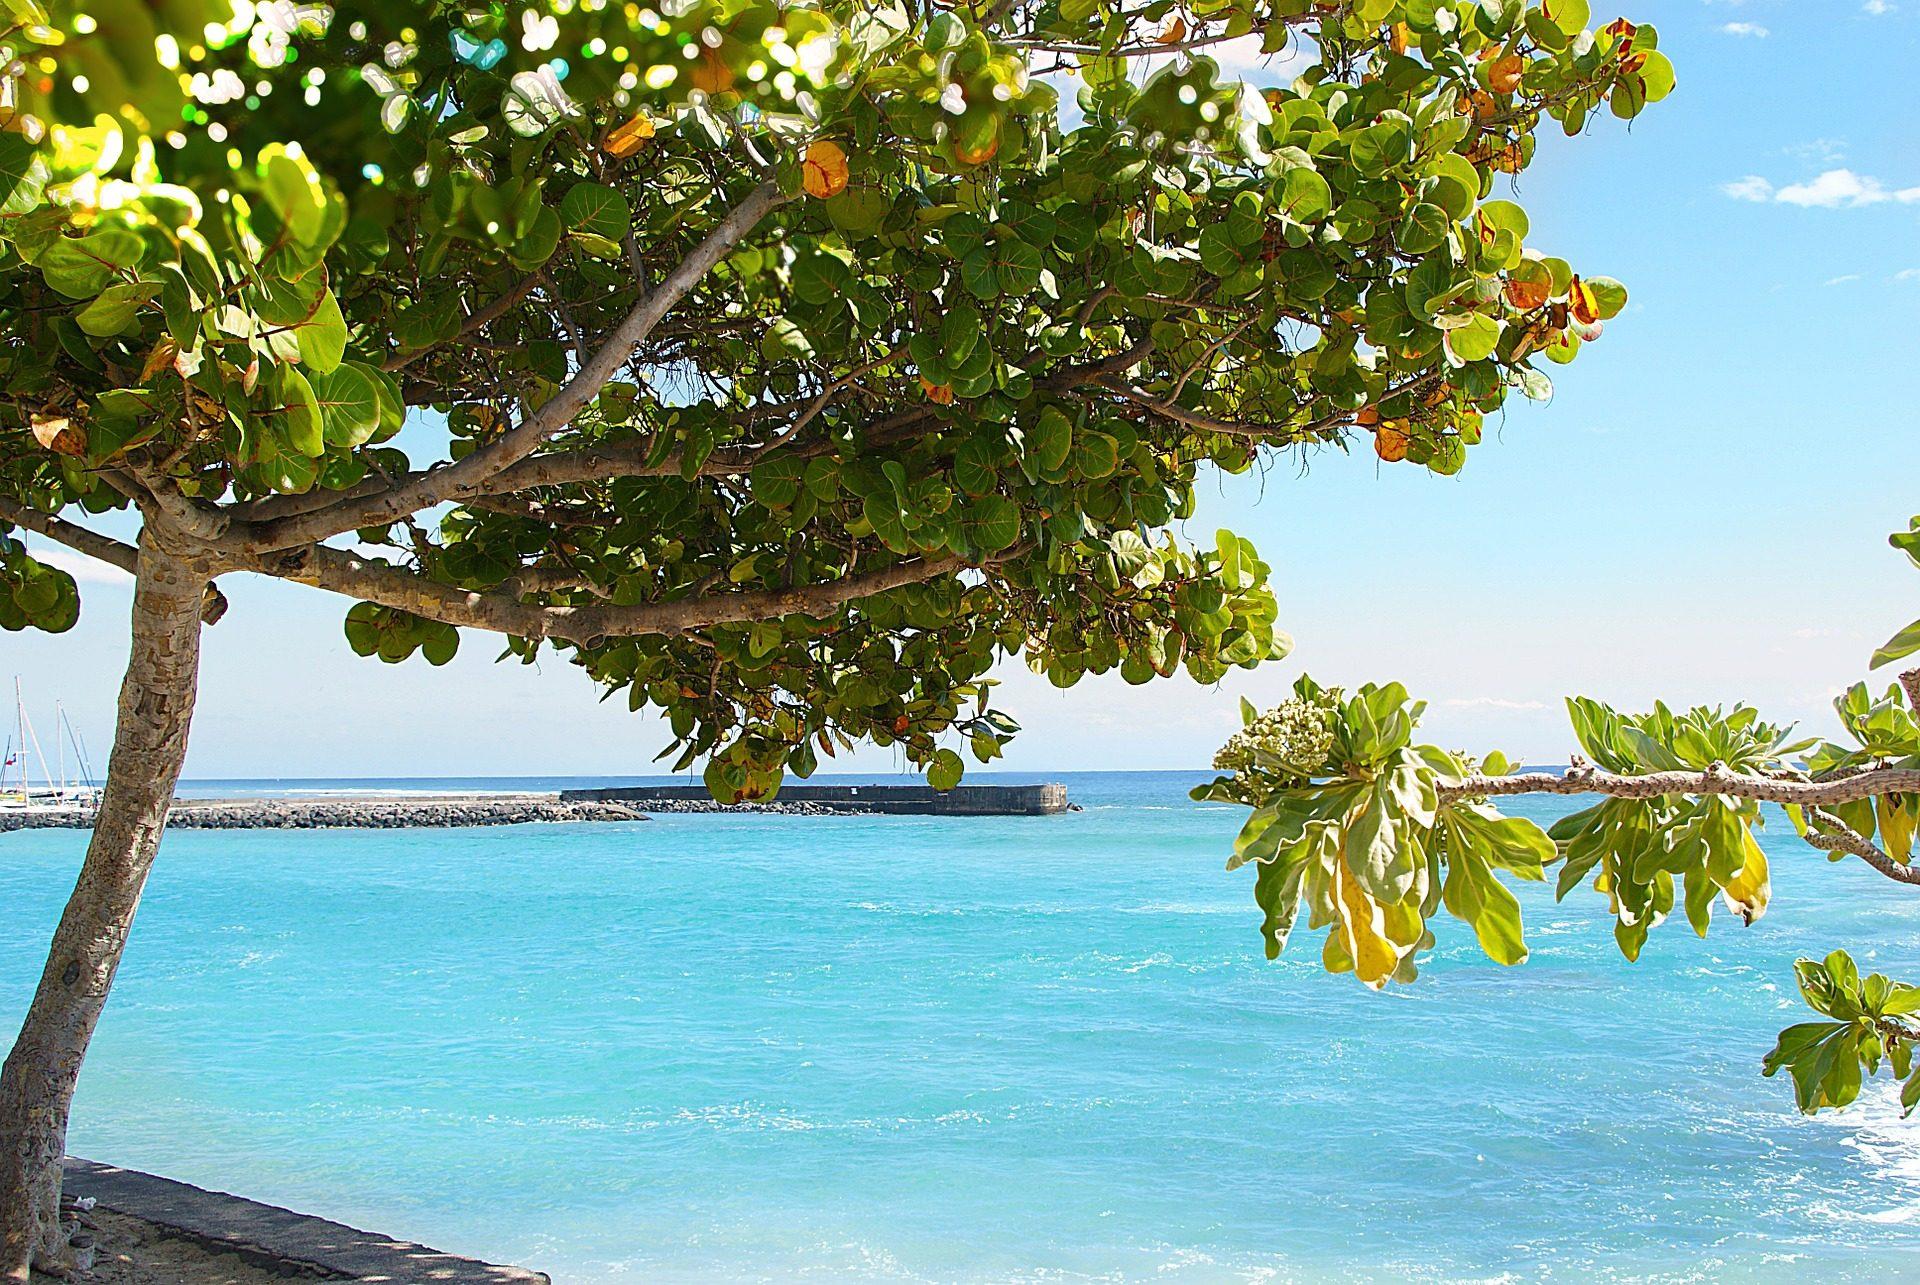 La Reunion Insel im indischen Ozean - Mauritius Nachbar Insel ab 1242,00€